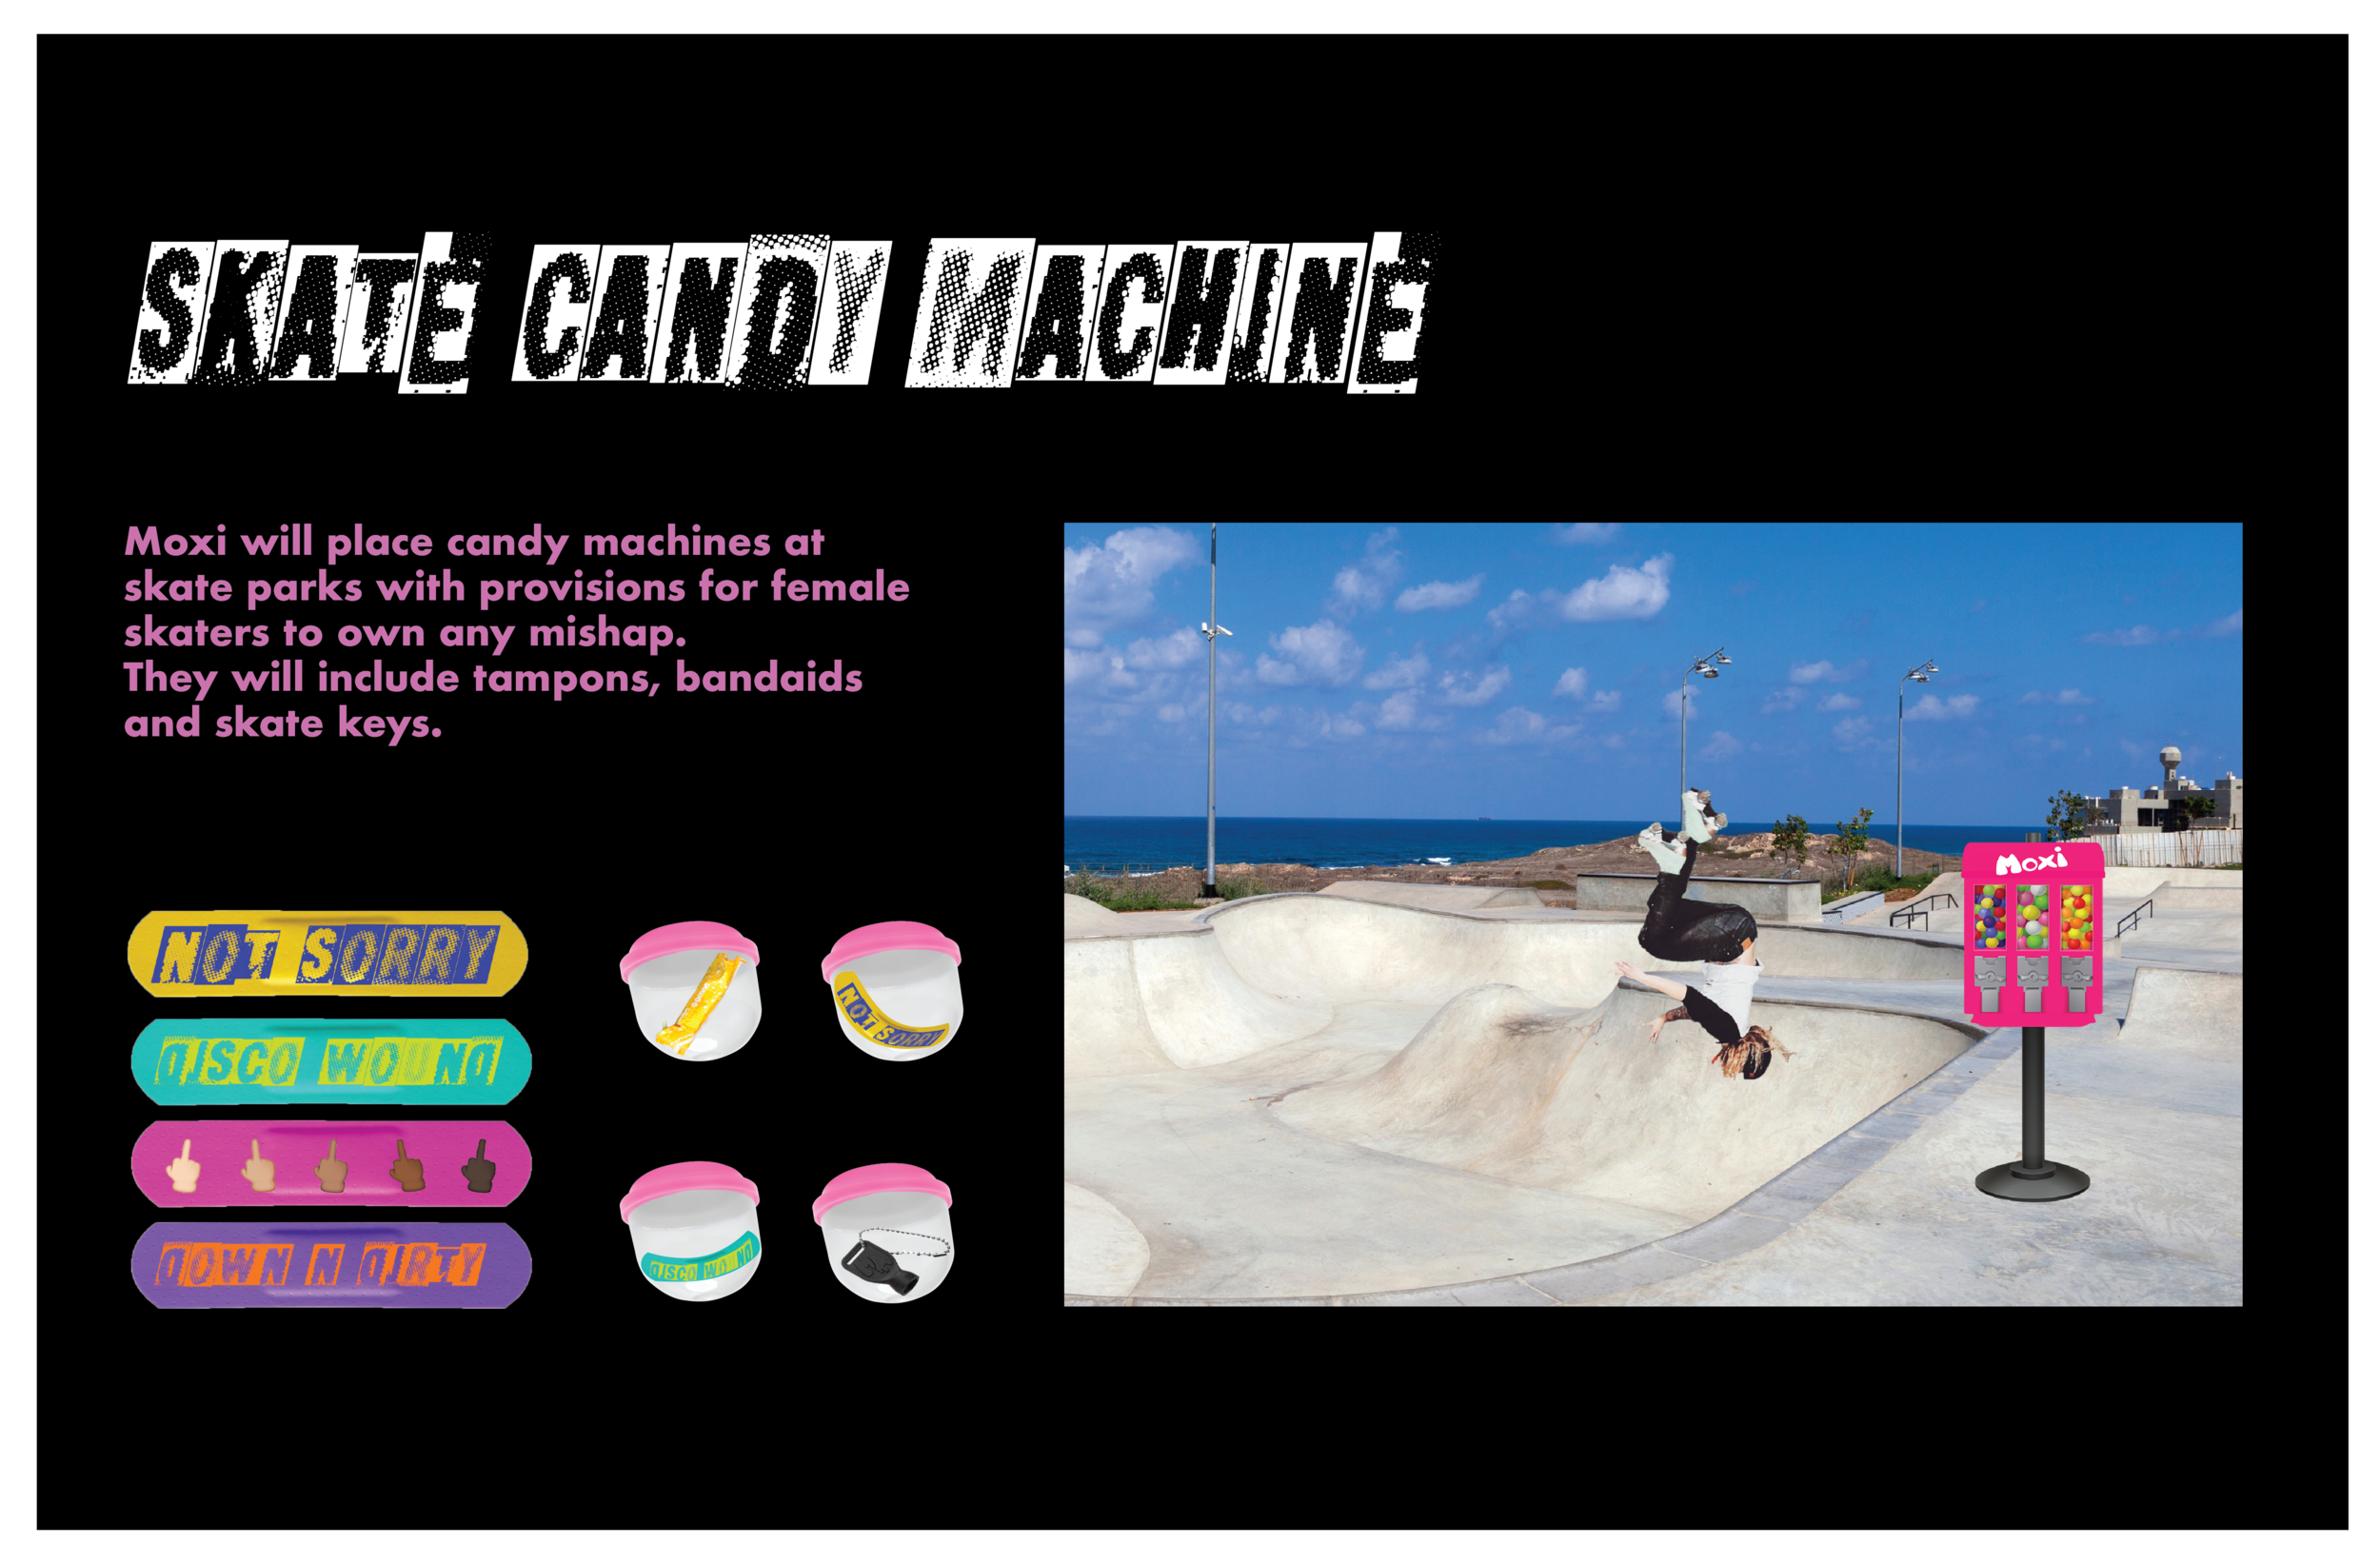 MOXI_REDO_OOH_final_CANDY MACHINE.png